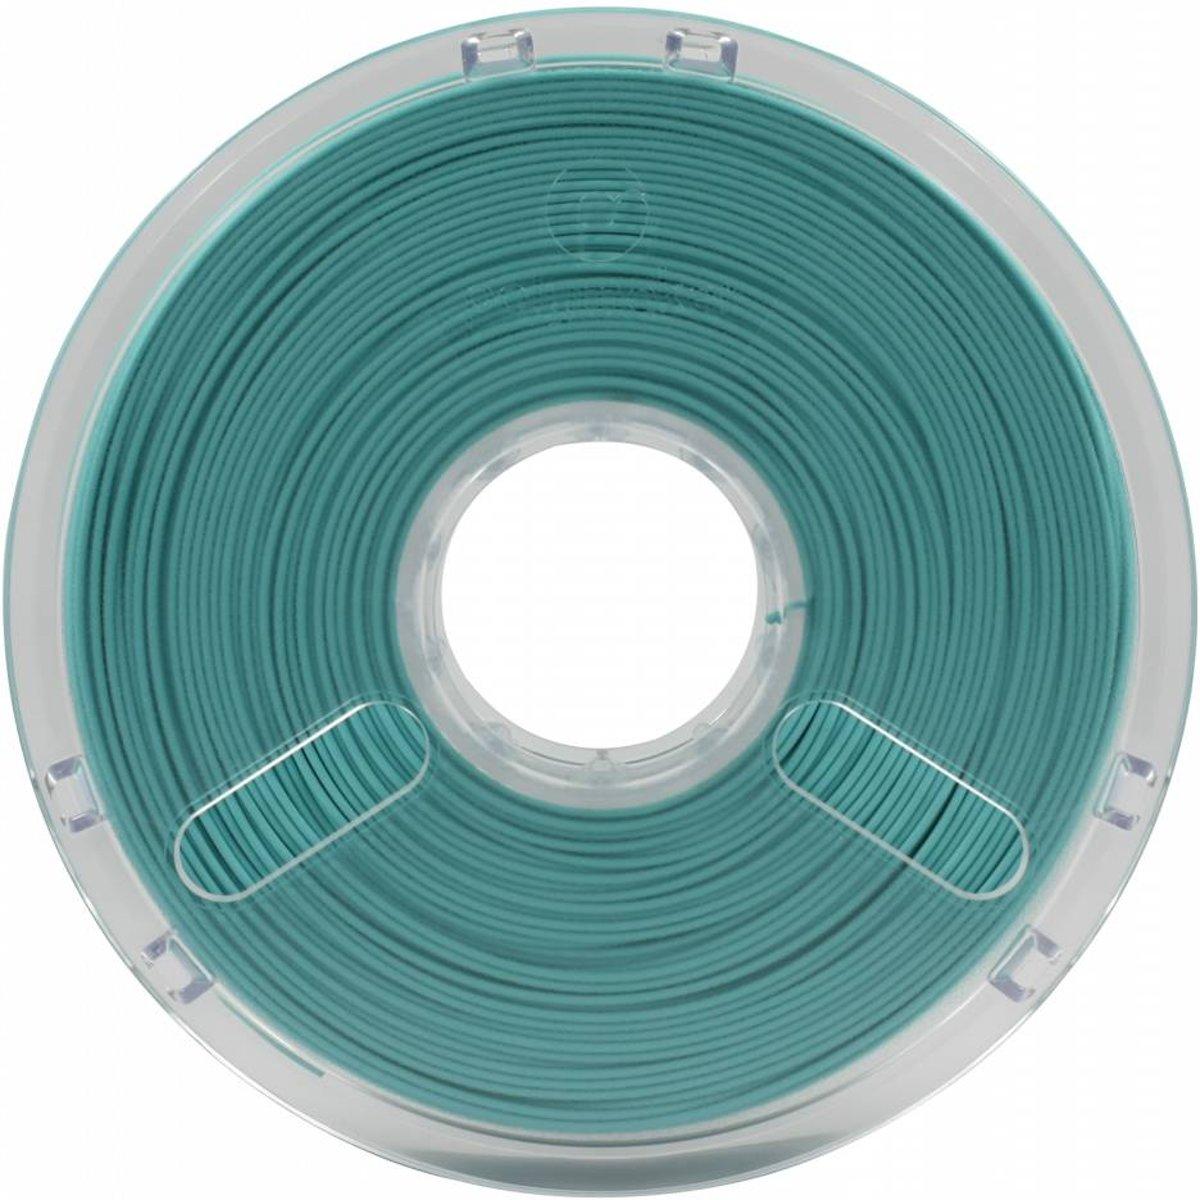 Polymaker Filament voor 3D-printer PolyMax PLA Jam Free Technology 1.75 mm 0.75 kg - True Teal